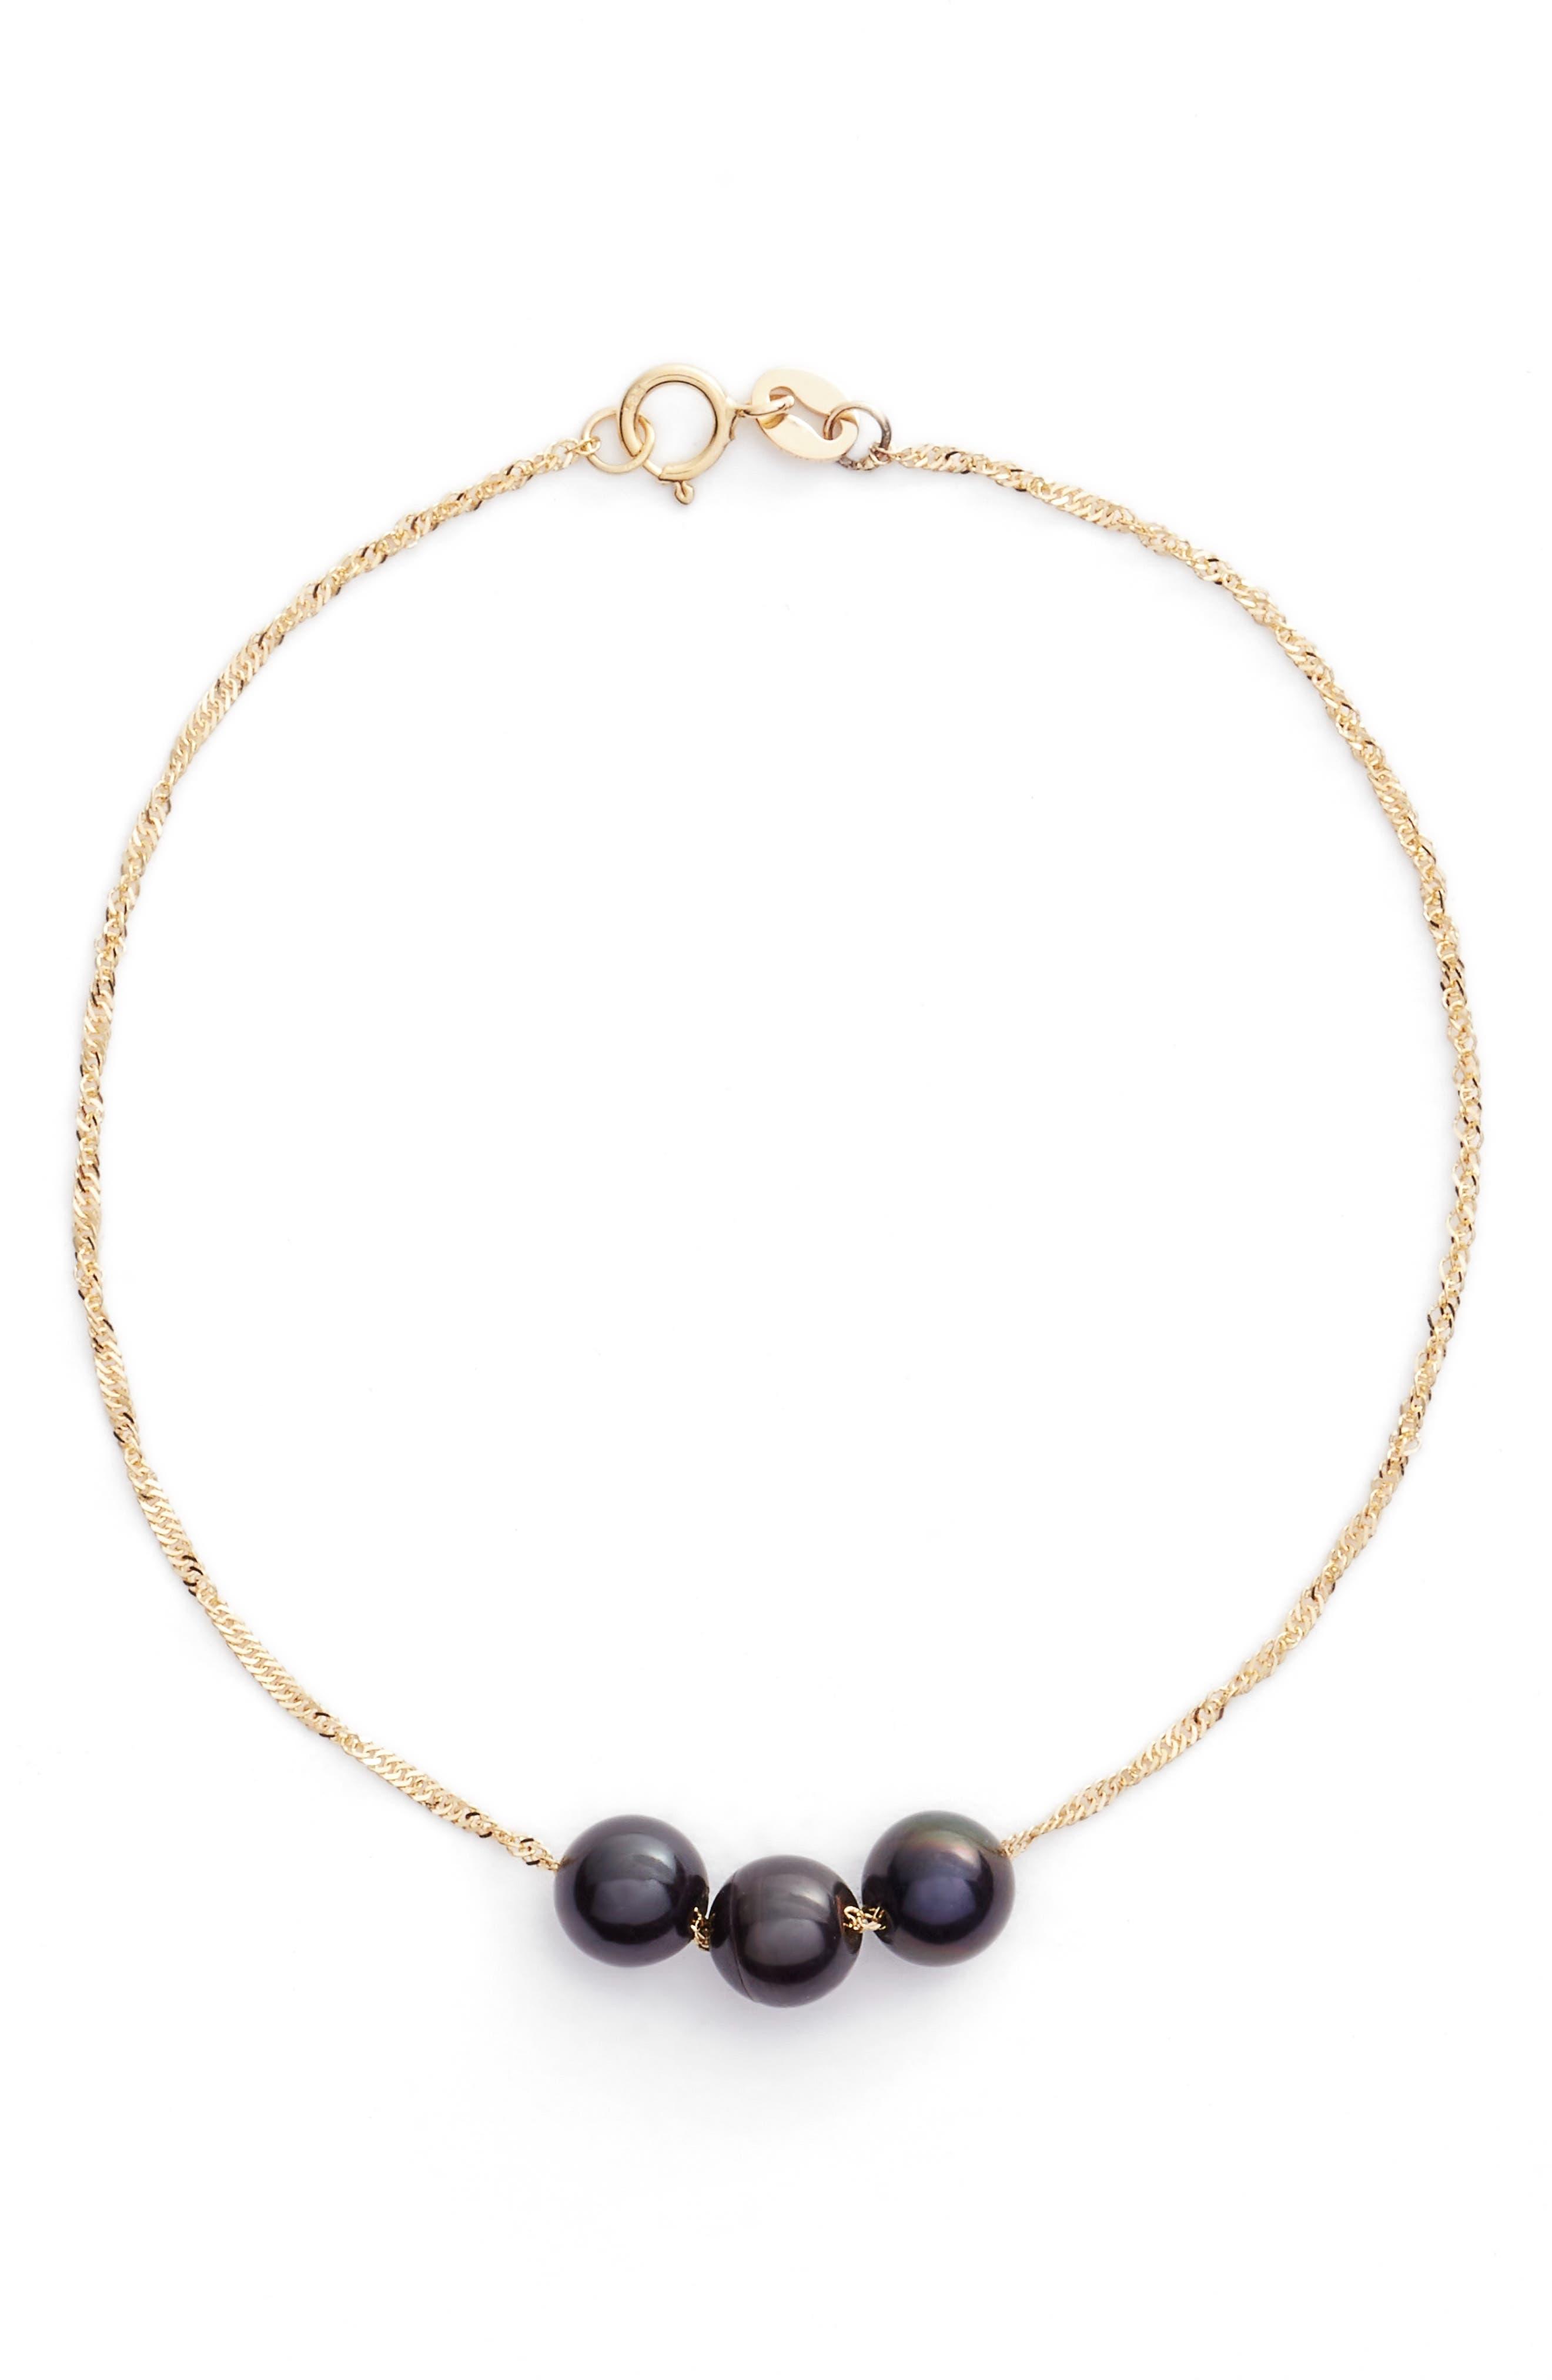 Triple Pearl Line Bracelet,                         Main,                         color, YELLOW GOLD/ BLACK PEARL